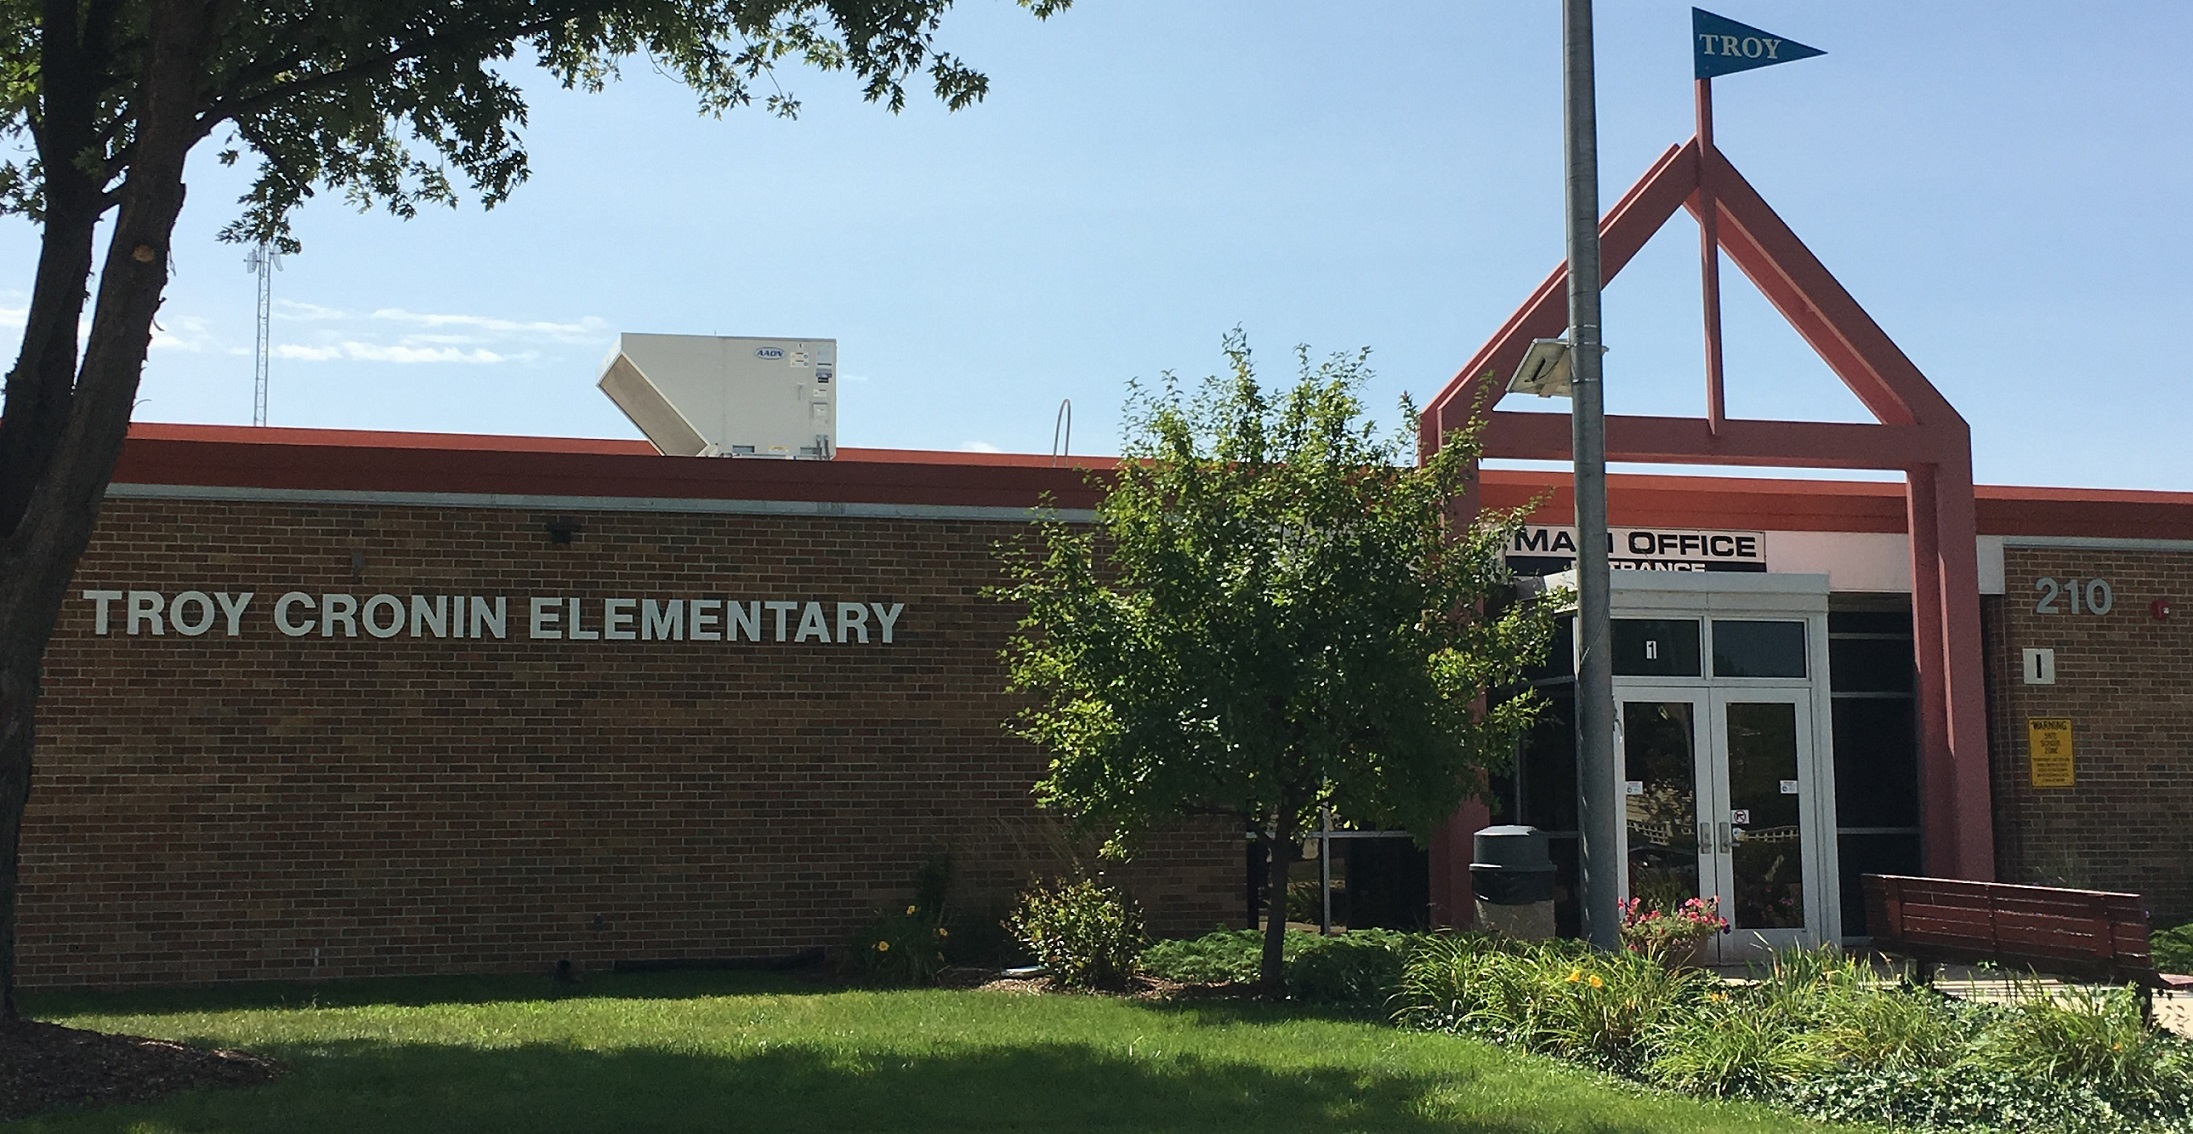 Home - Troy Cronin Elementary